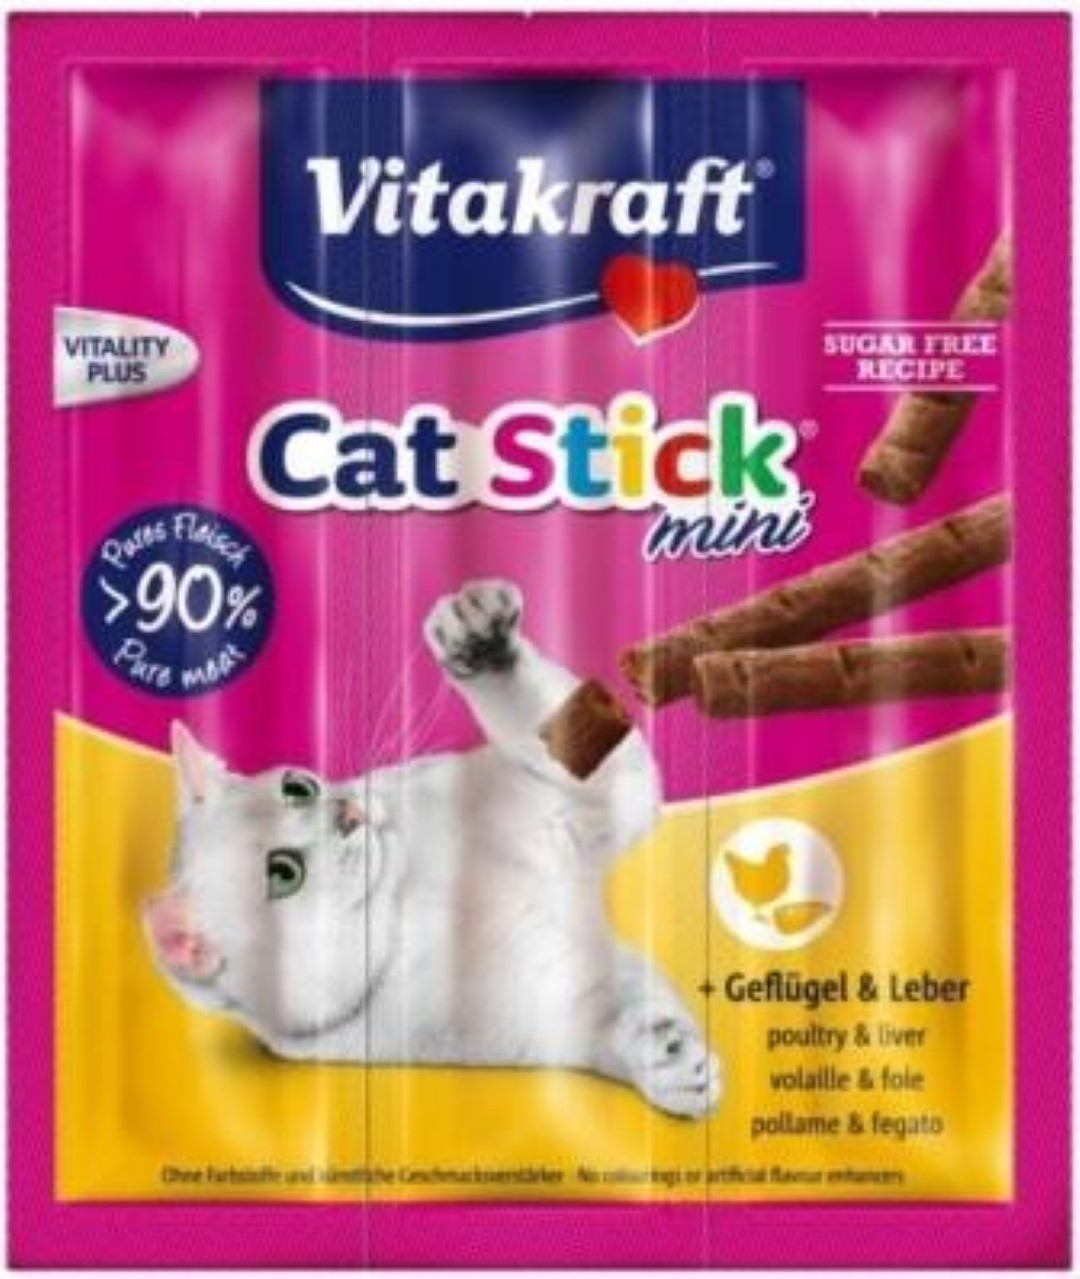 Vitakraft Cat-Stick mini gevogelte & lever (Besteleenheid per 20)